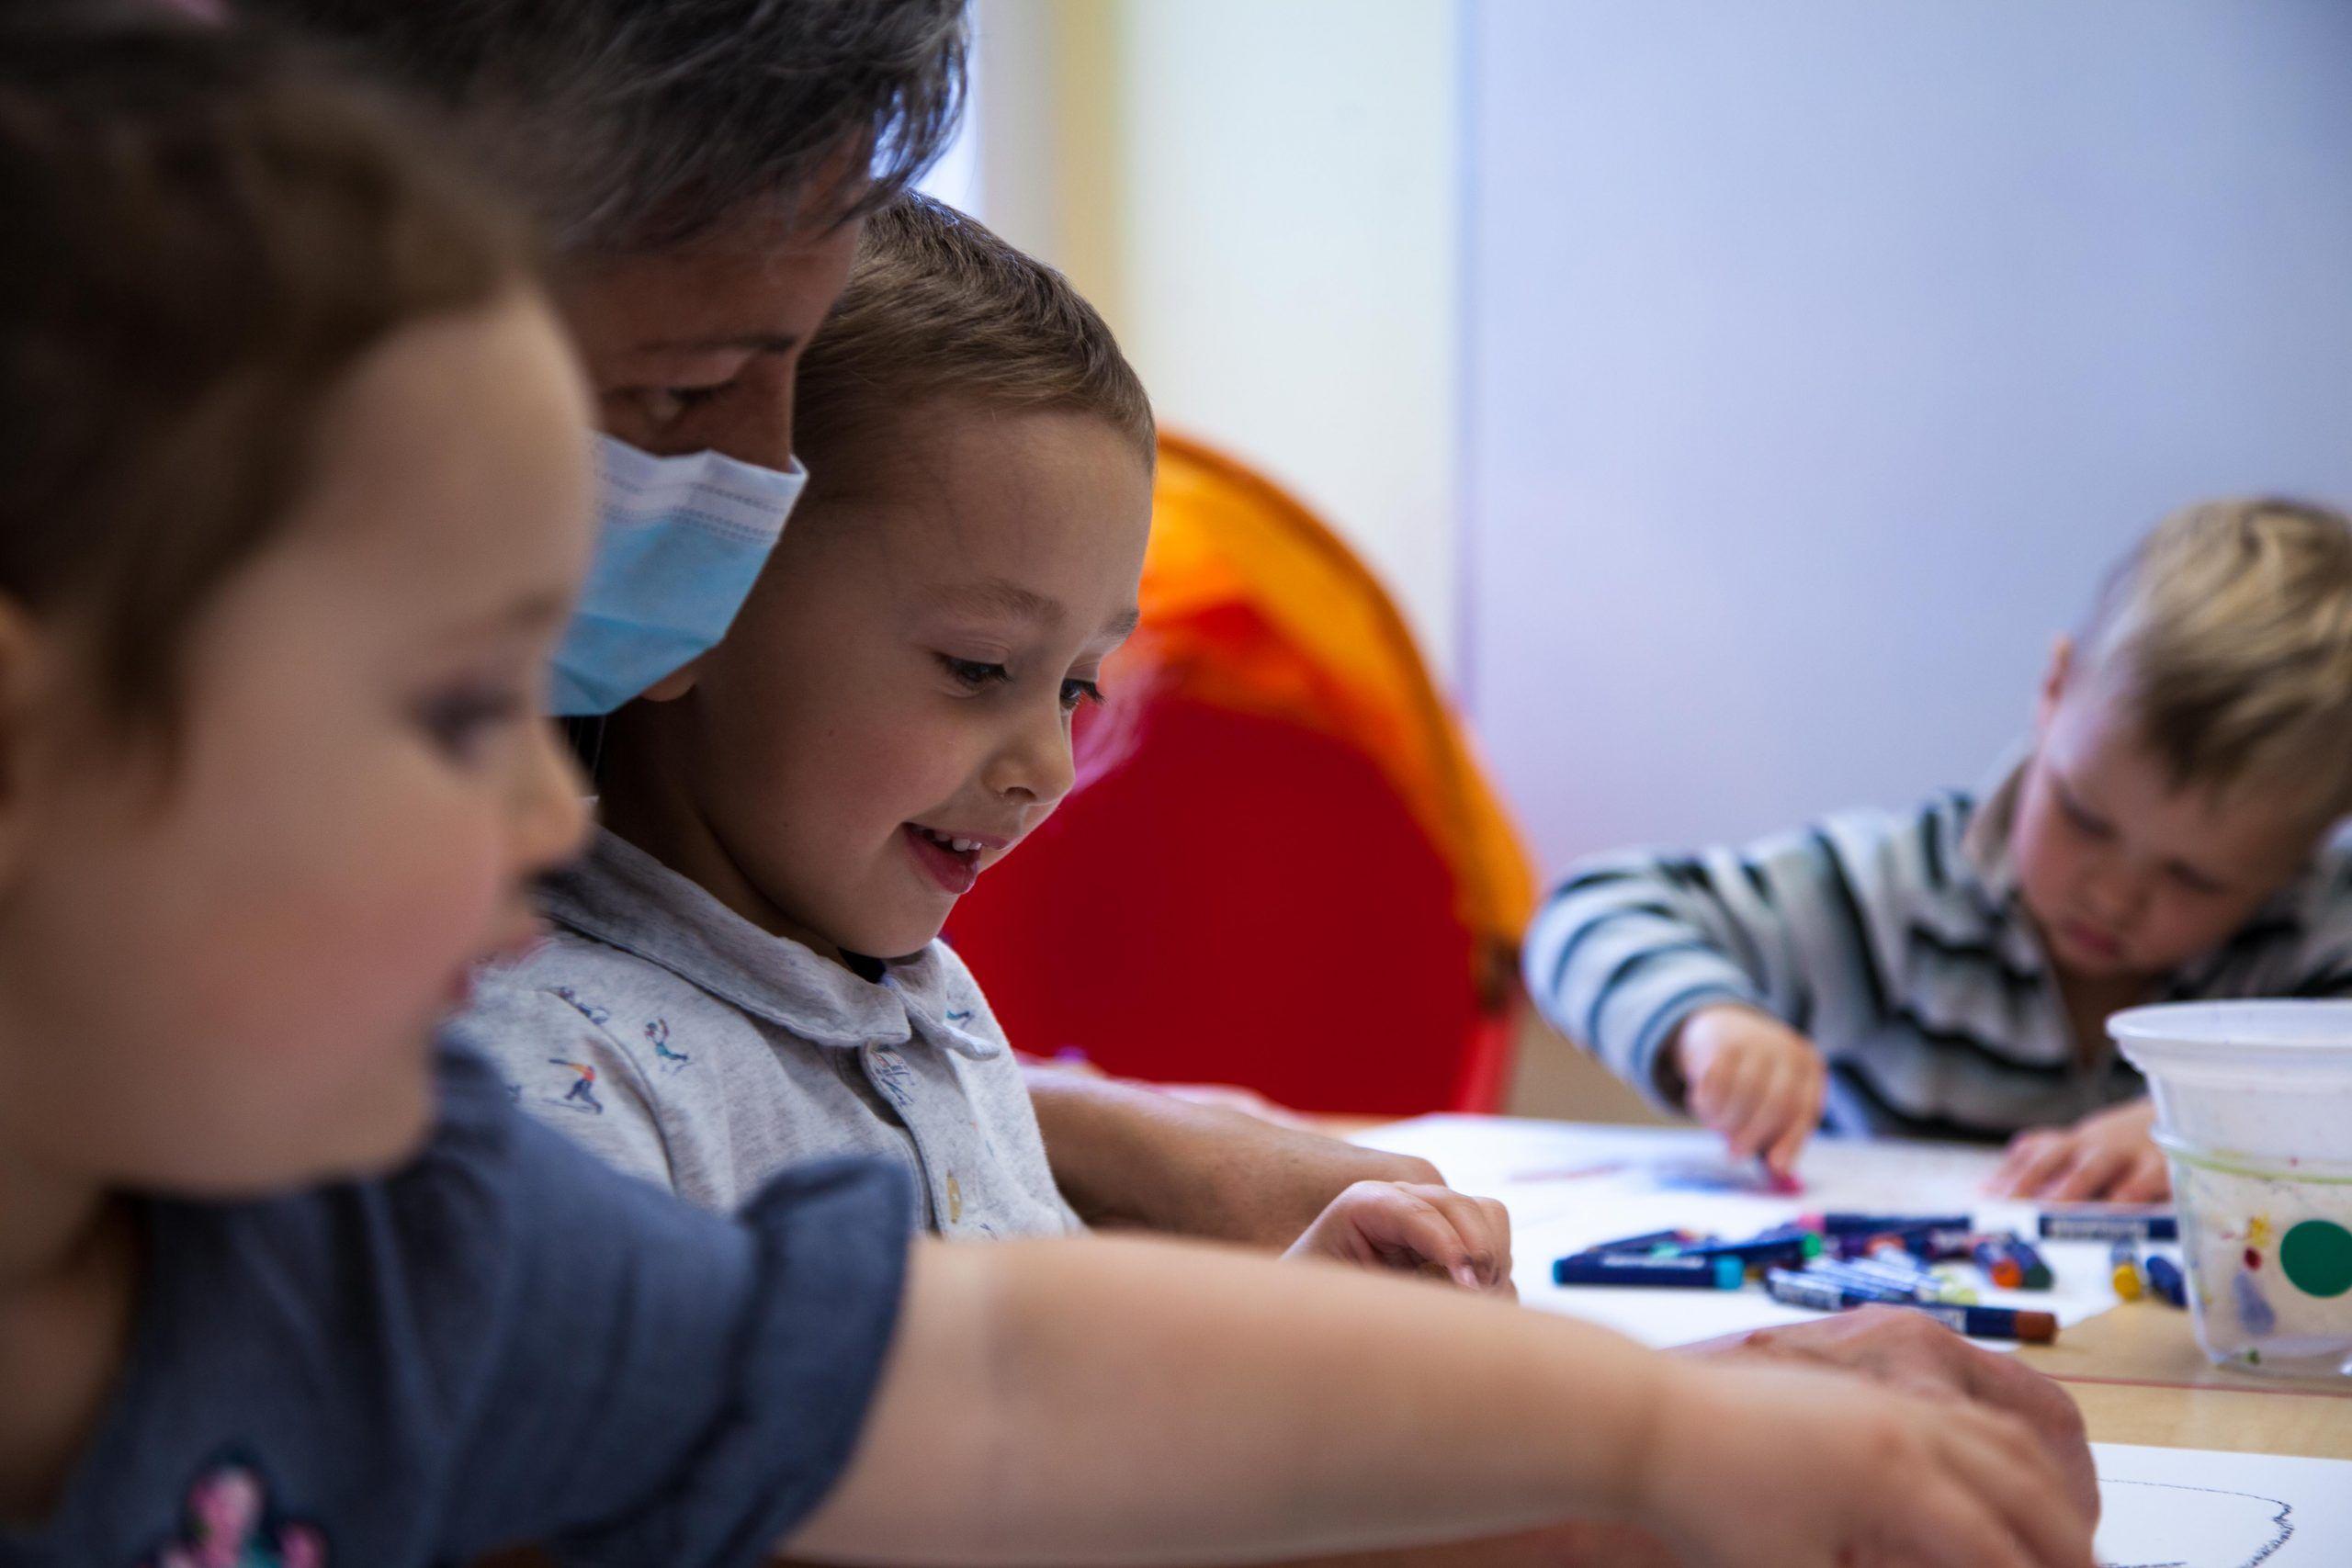 Atelier créatif avec petits de CPE - Musée d'art de Rouyn-Noranda